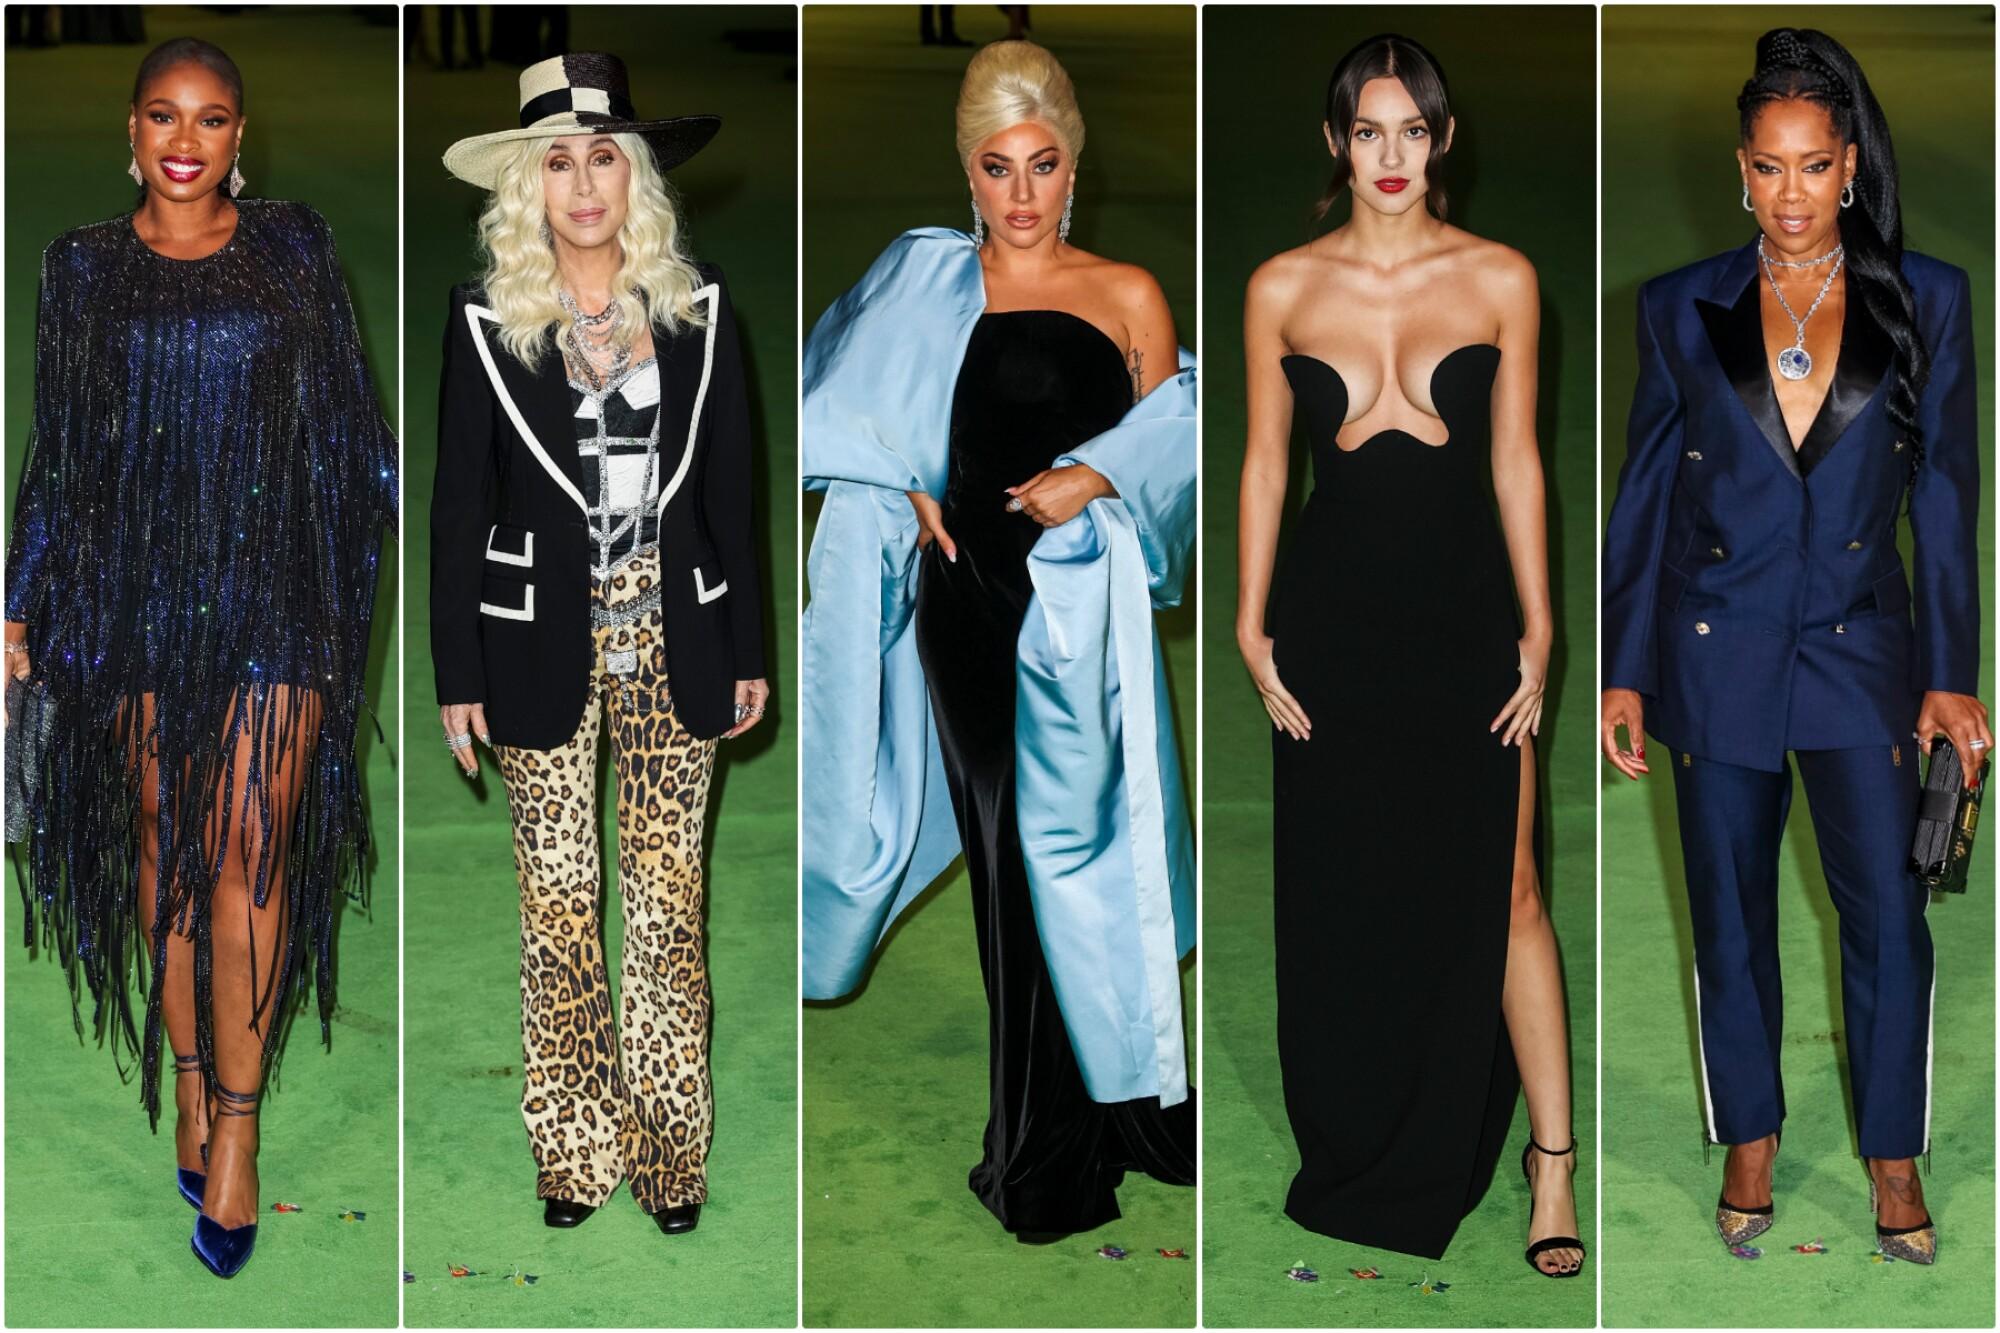 Jennifer Hudson, Cher, Lady Gaga, Olivia Rodfrigo and Regina King